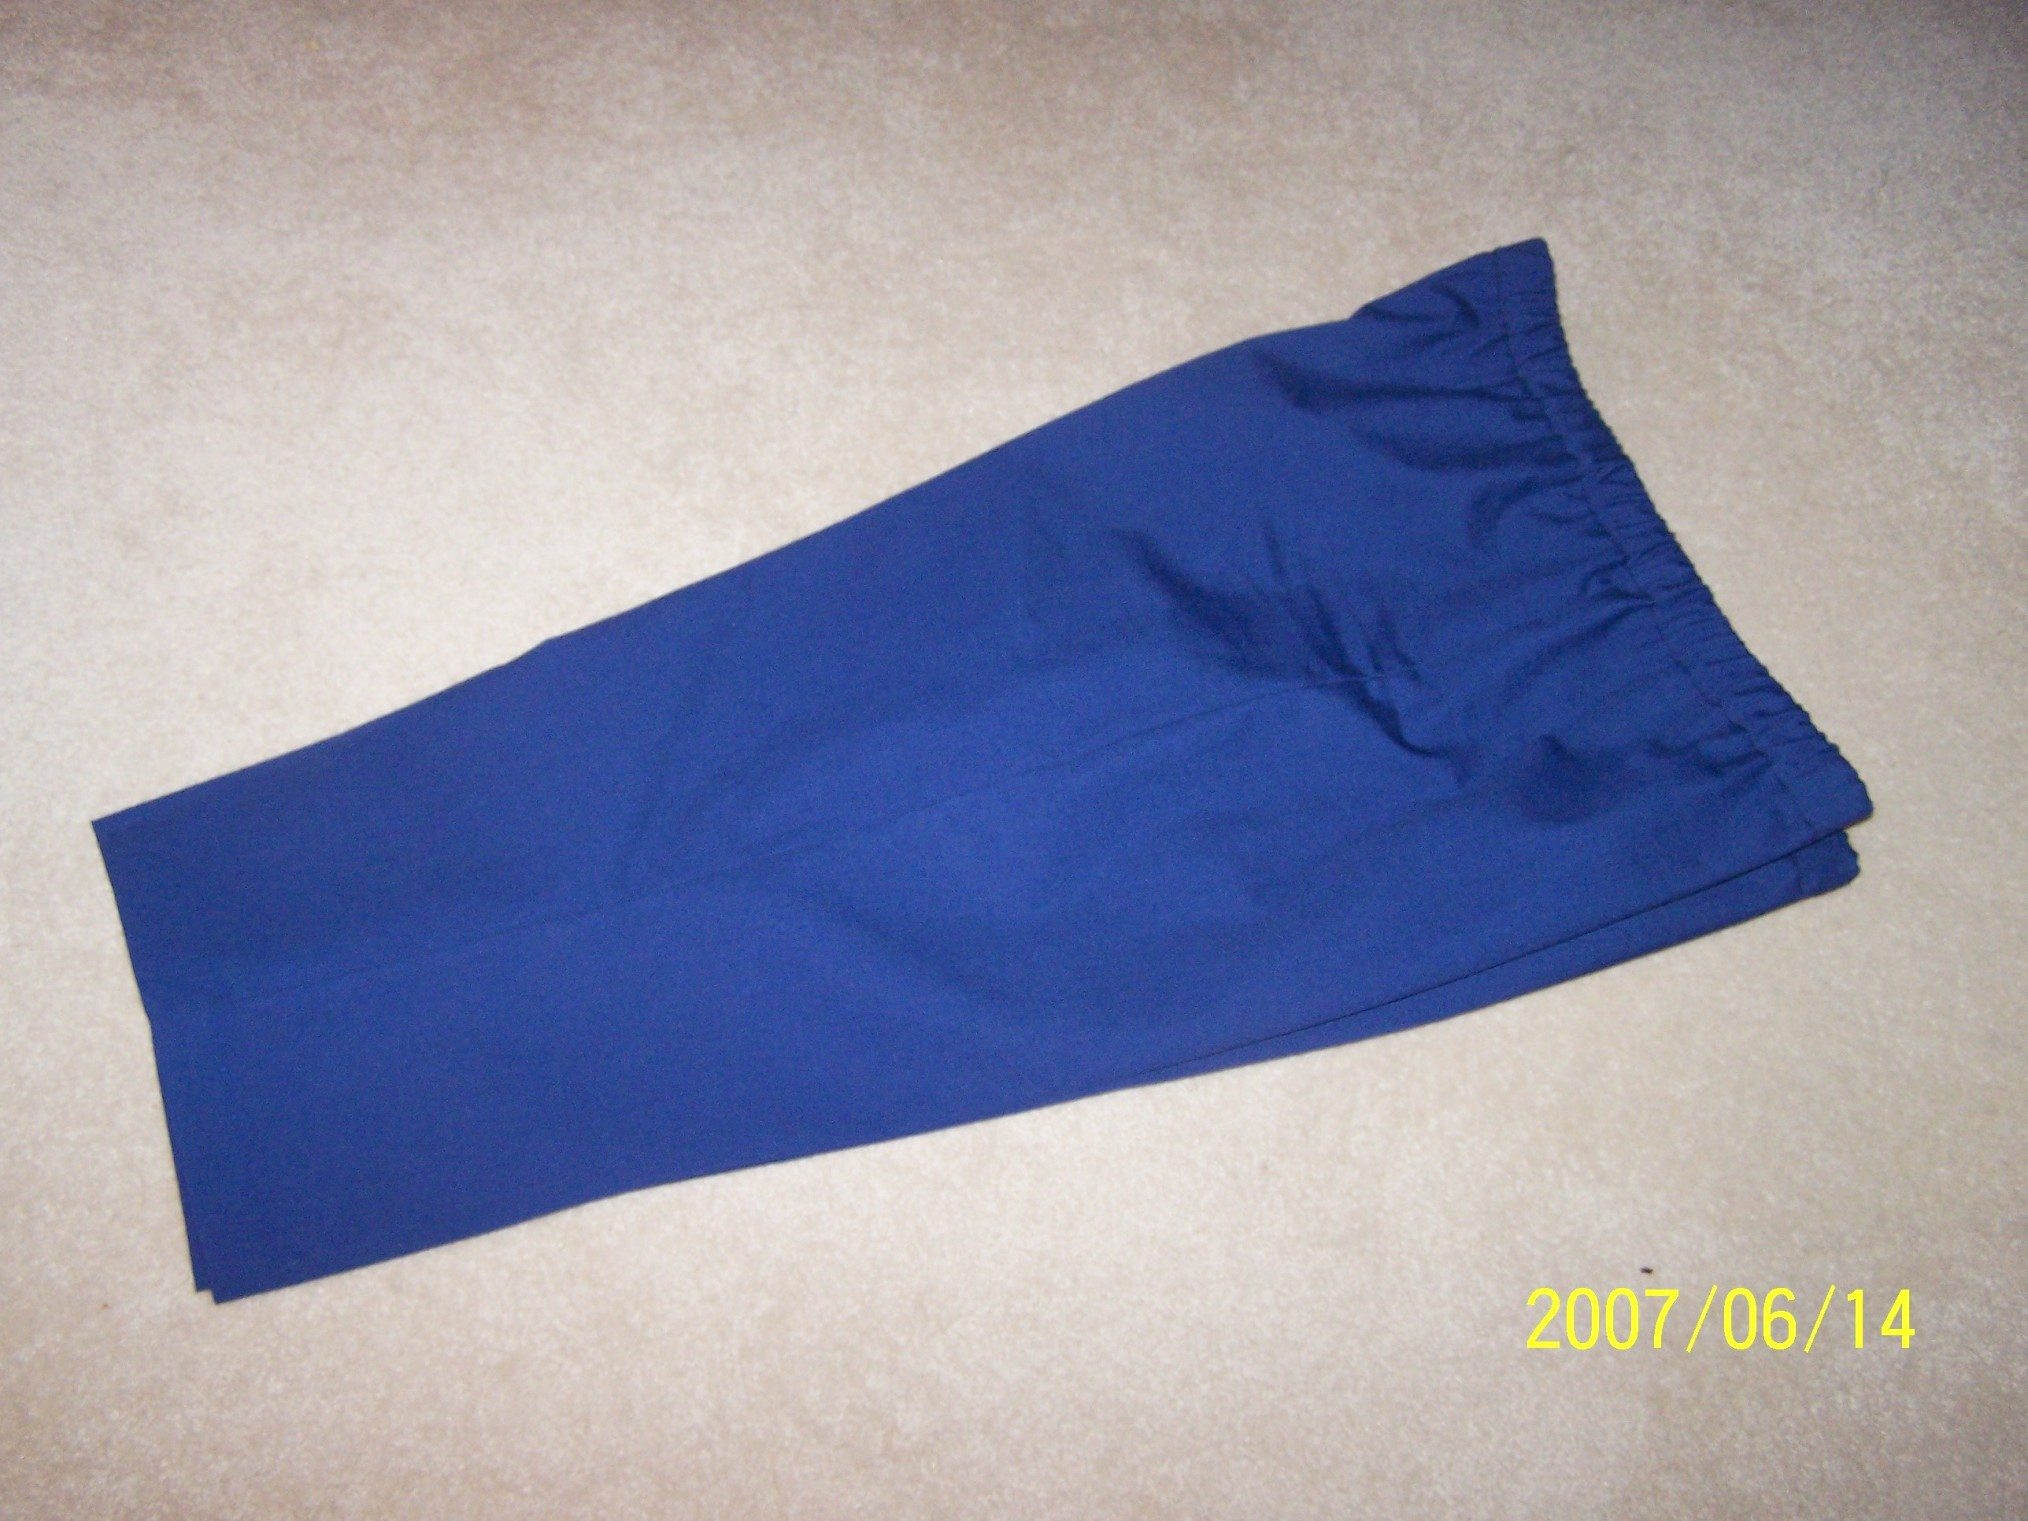 bluepants.jpg